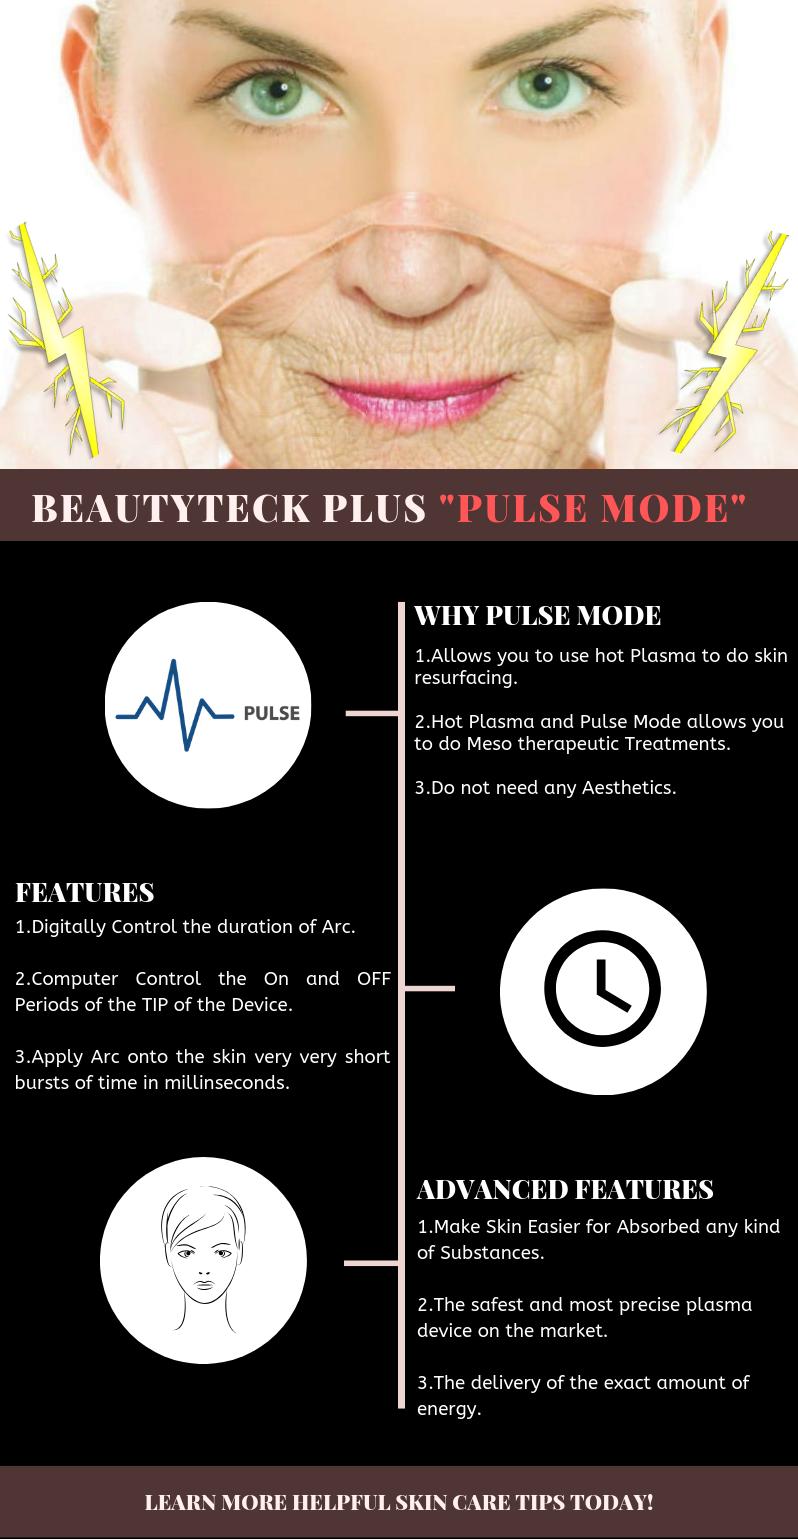 Beautyteck Plus Pulse Mode